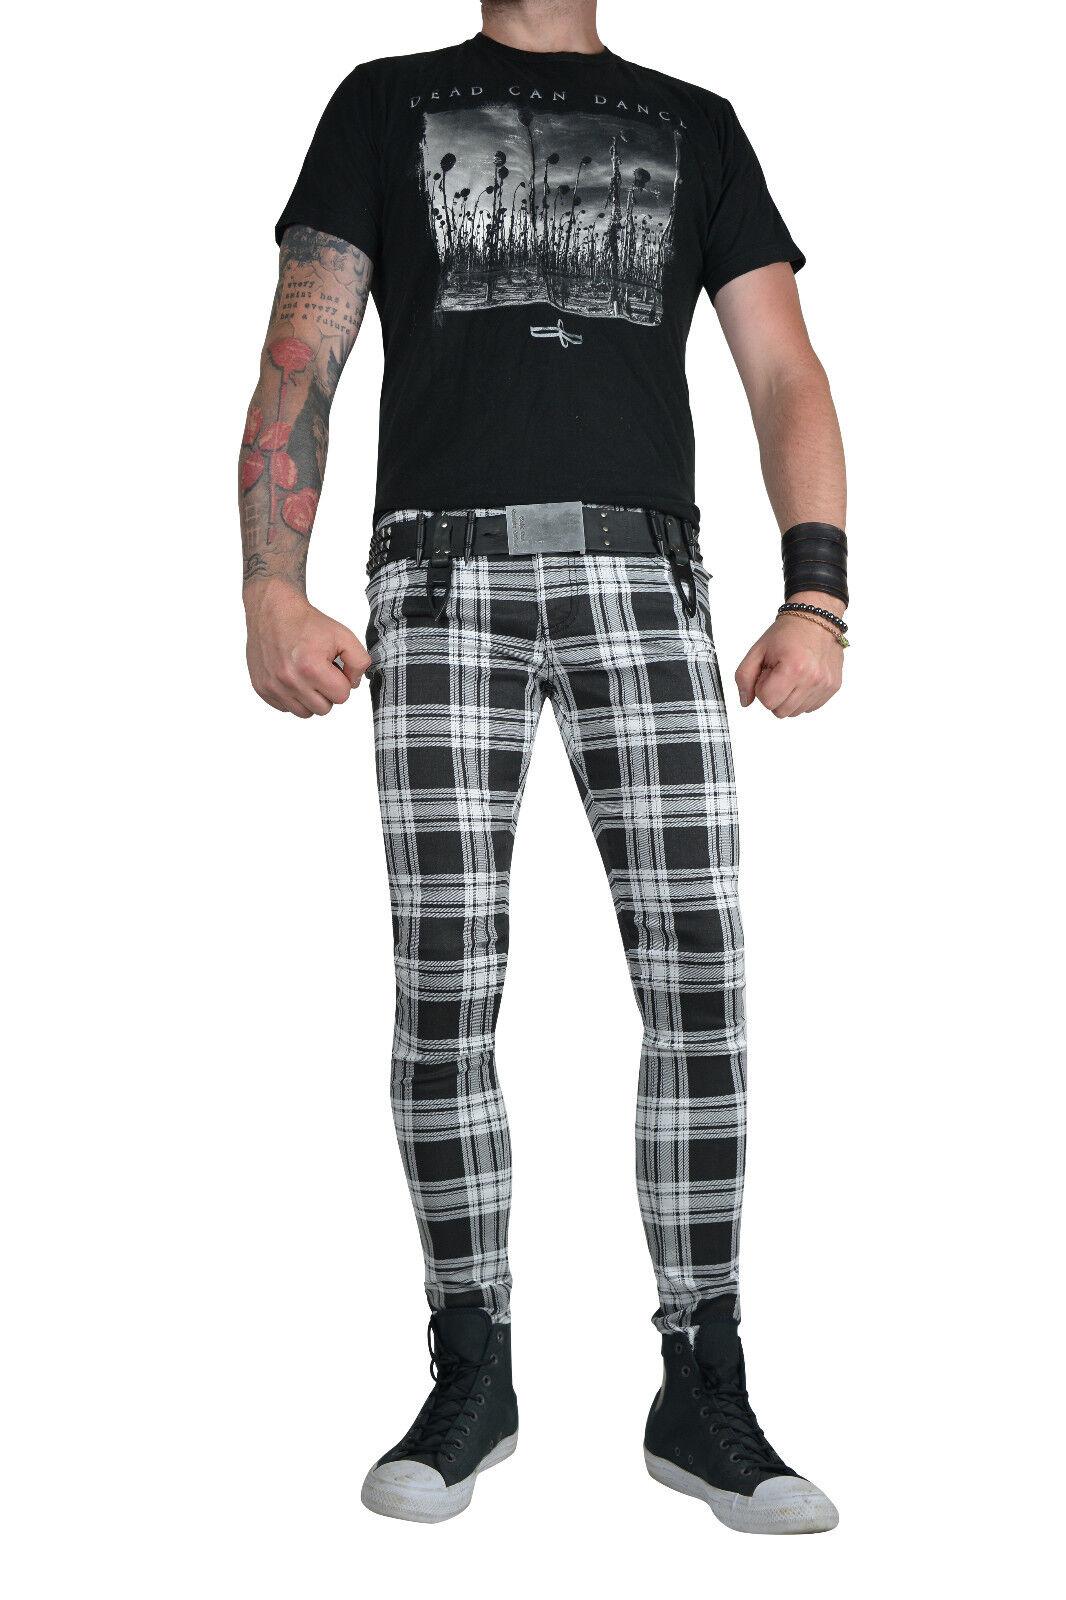 TRIPP WHITE BLACK PLAID SKINNY JEANS TARTAN ROCKSTAR UNISEX FIT PUNK ROCK PANTS Clothing, Shoes & Accessories